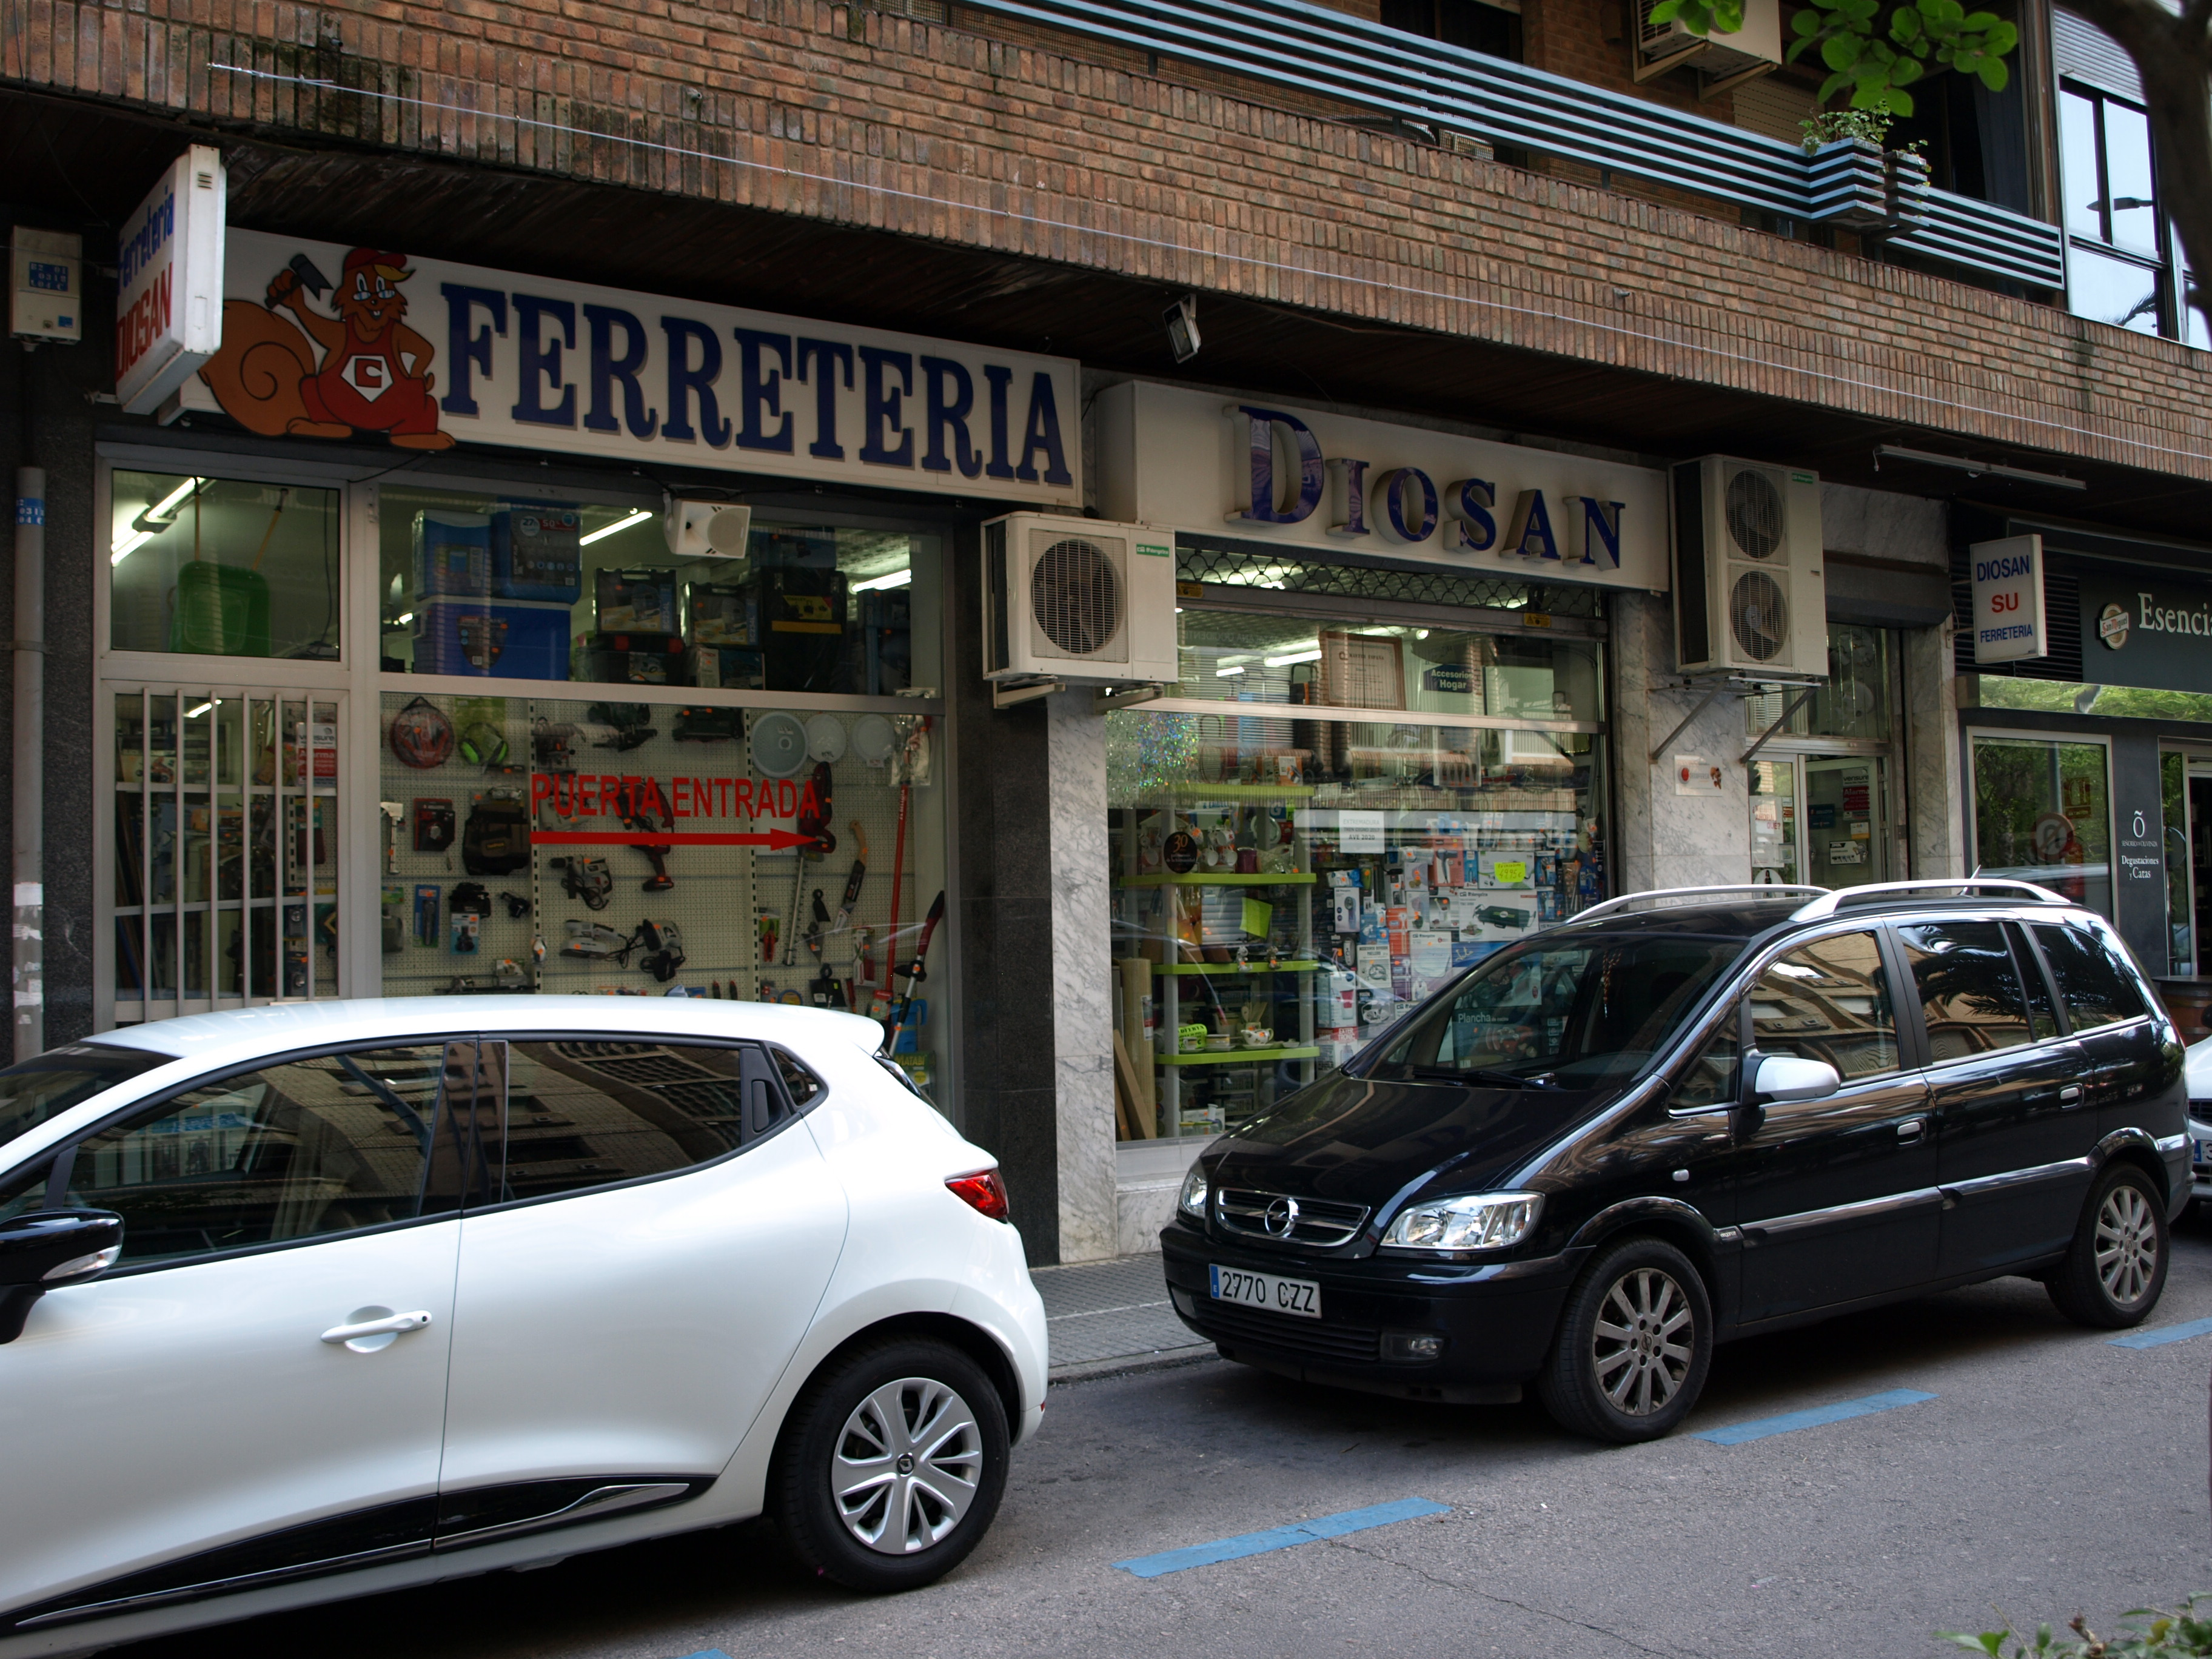 ESPAÑA FERRETERIA DIOSAN S.L CÁCERES